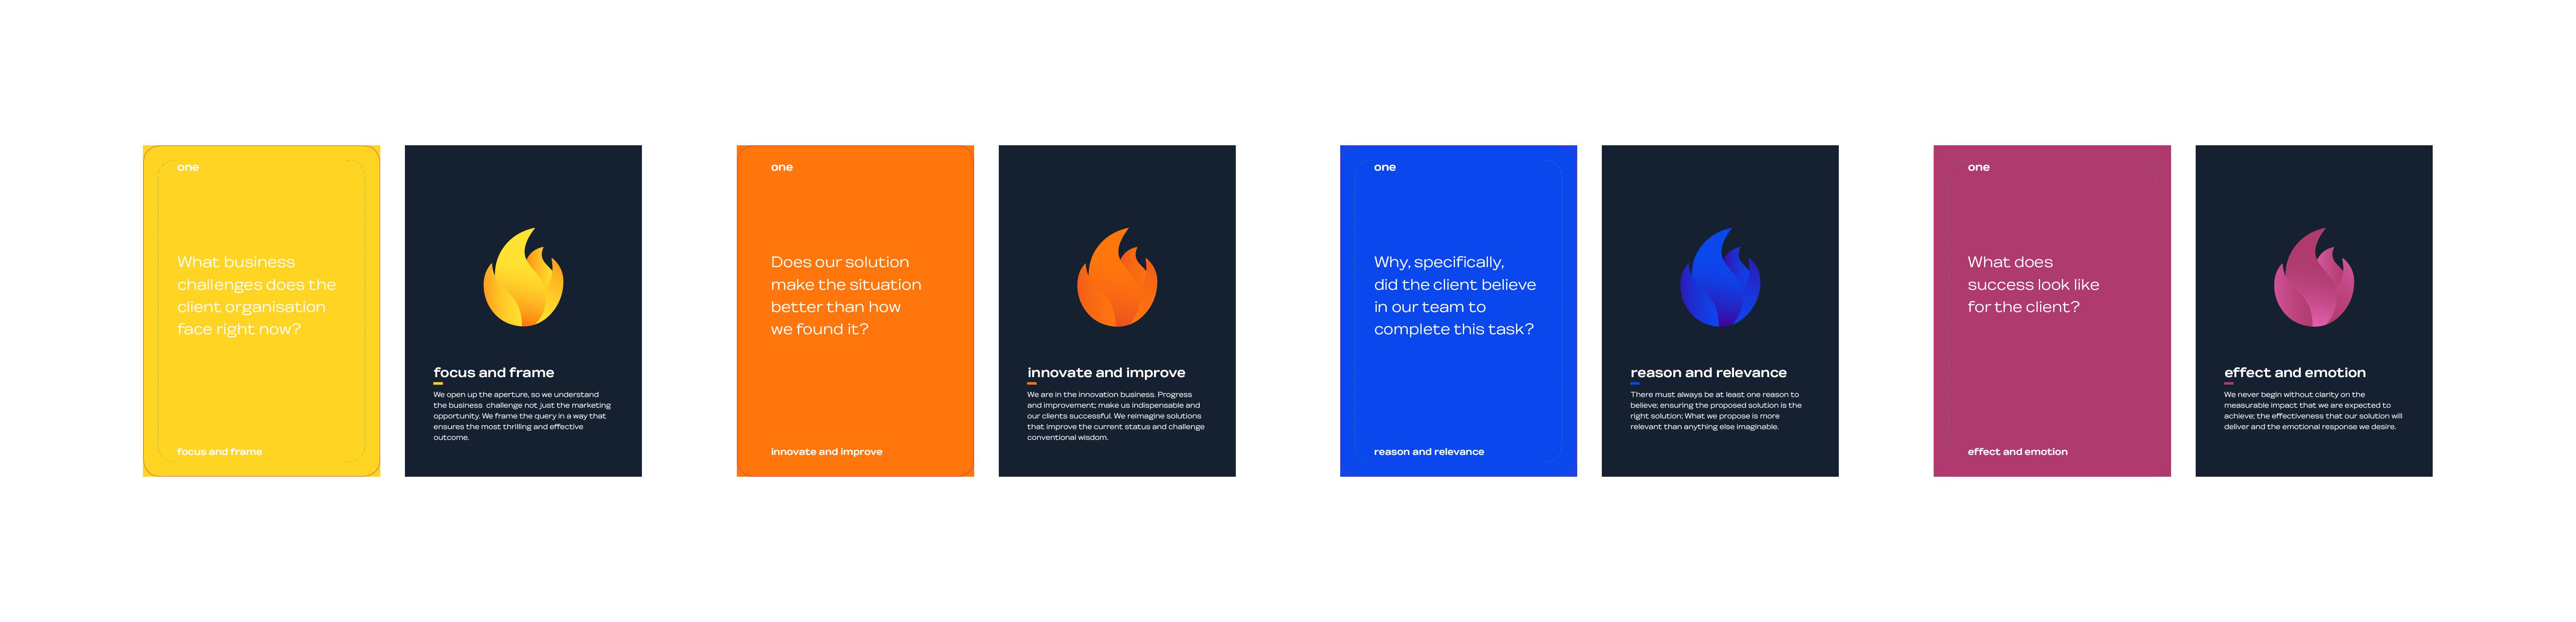 Fire-Film-design_3-02